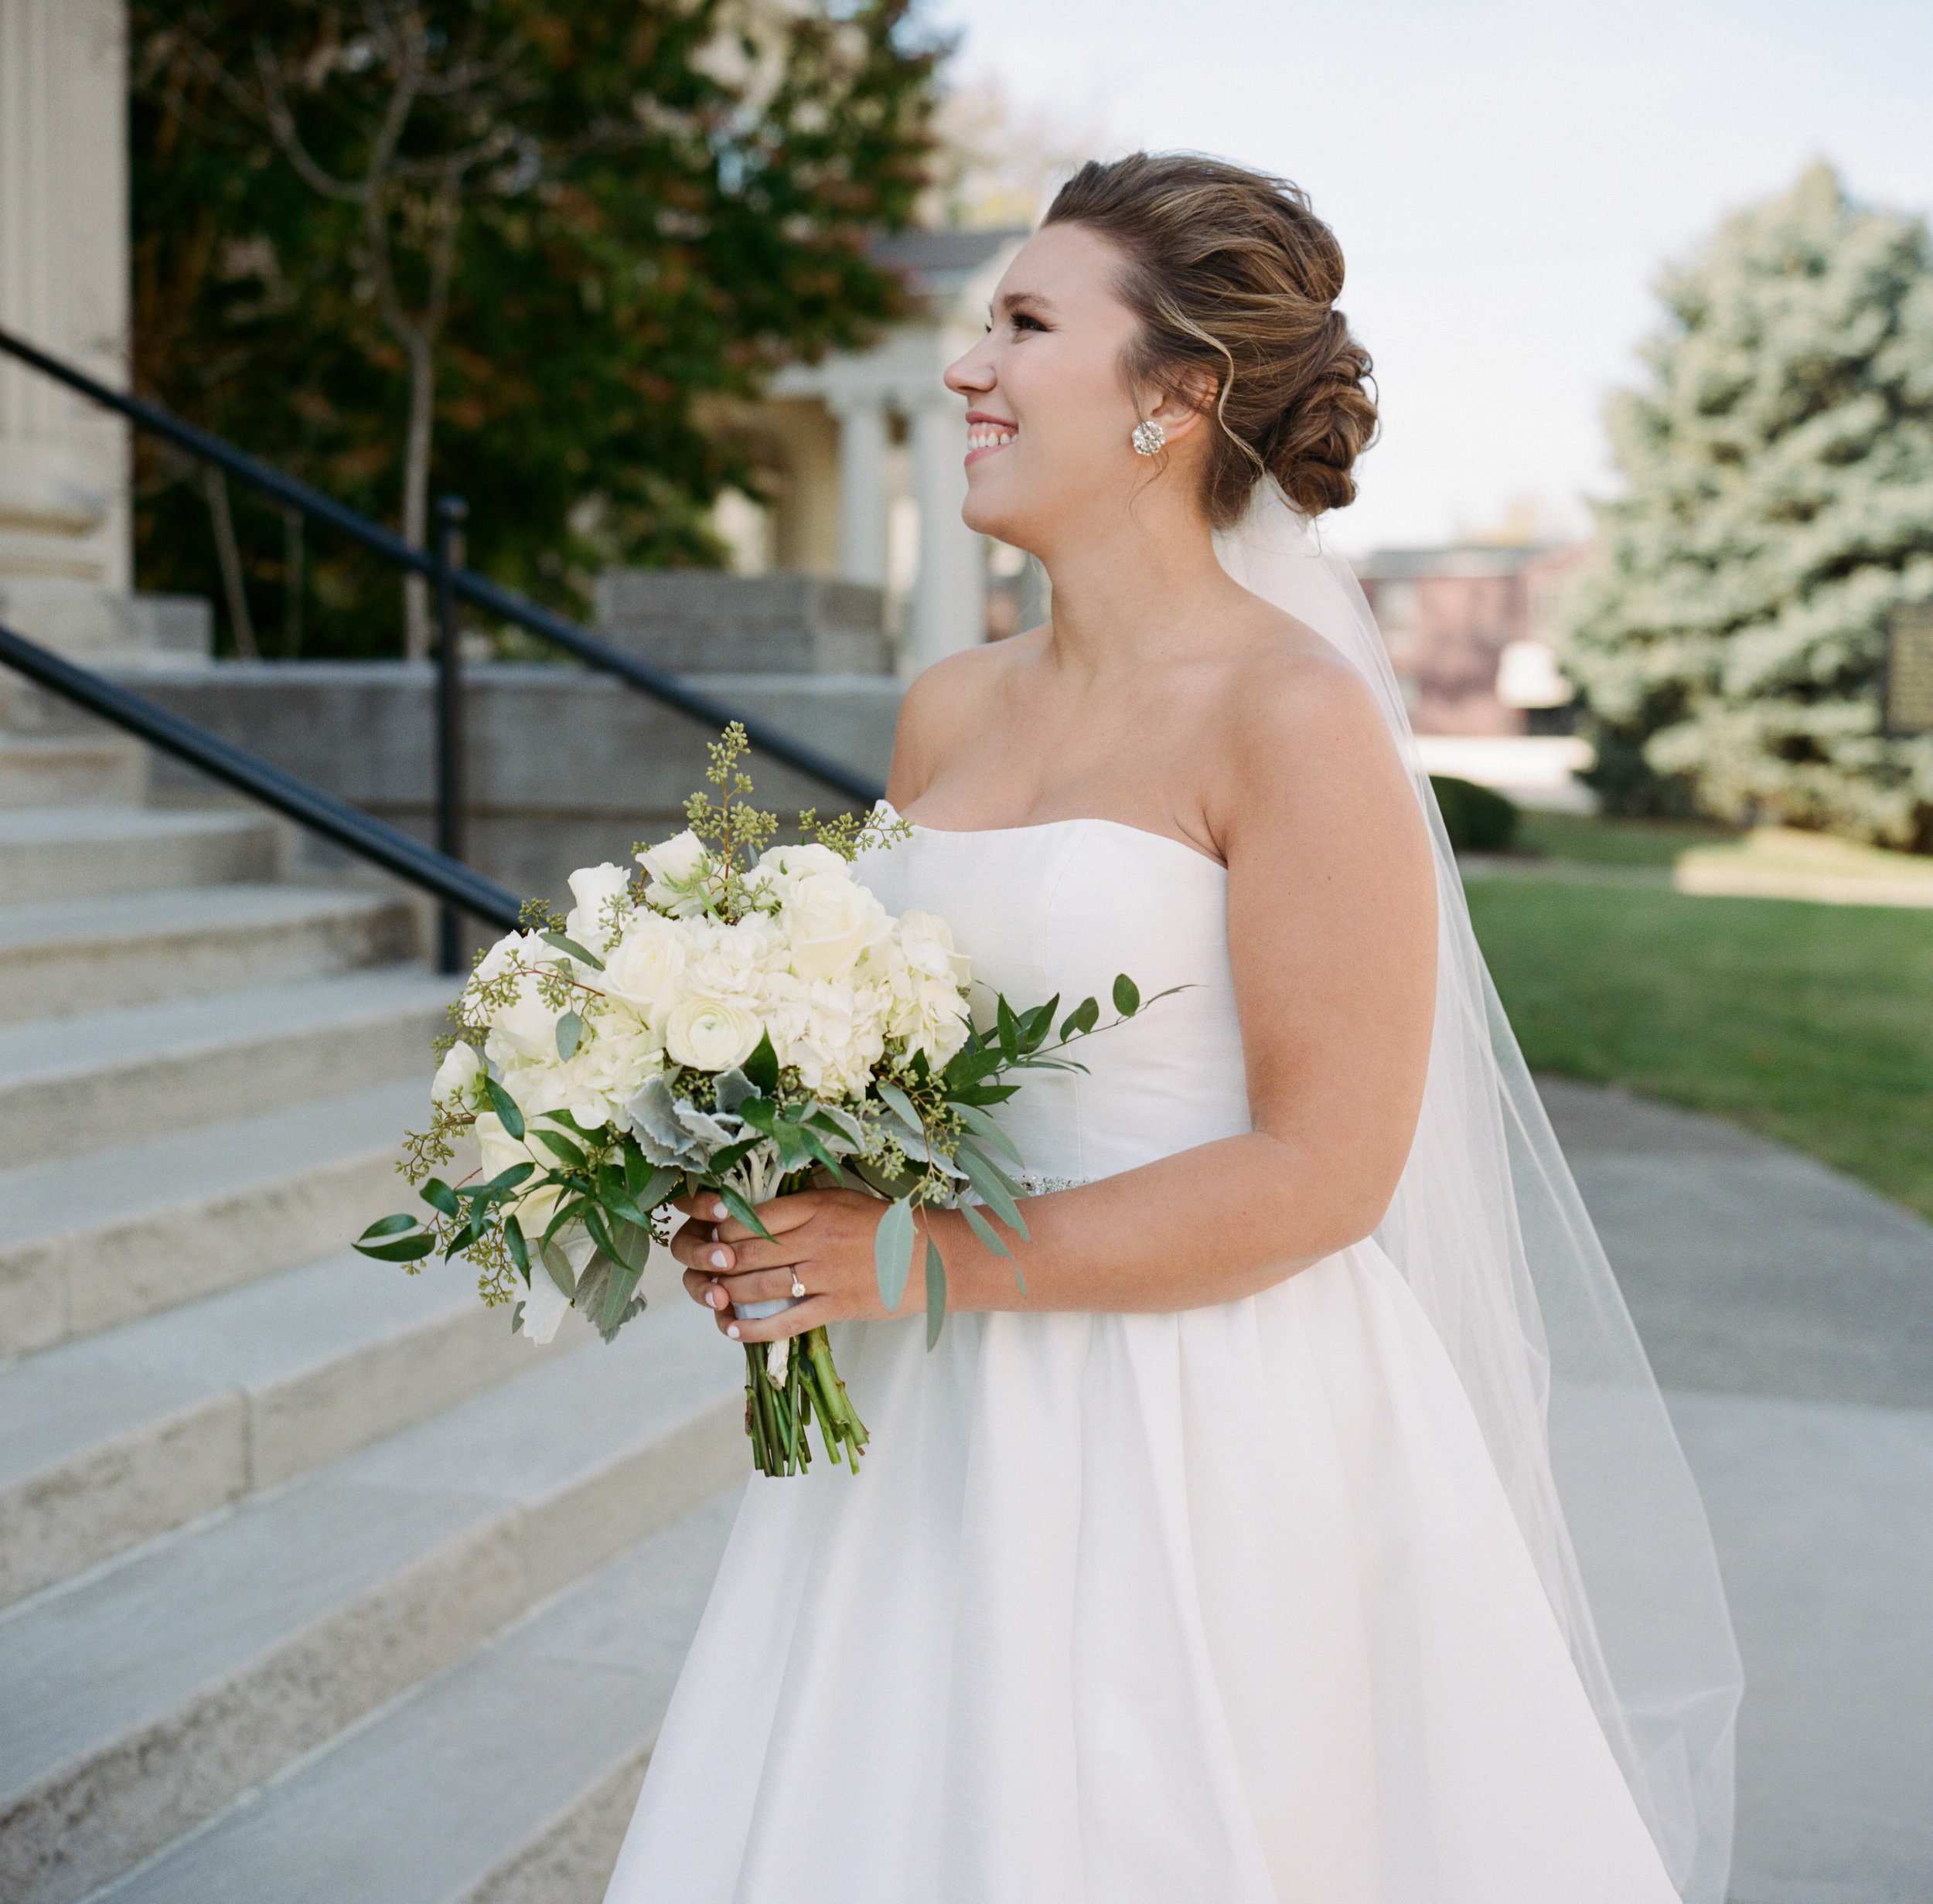 02_Bride-1.jpg